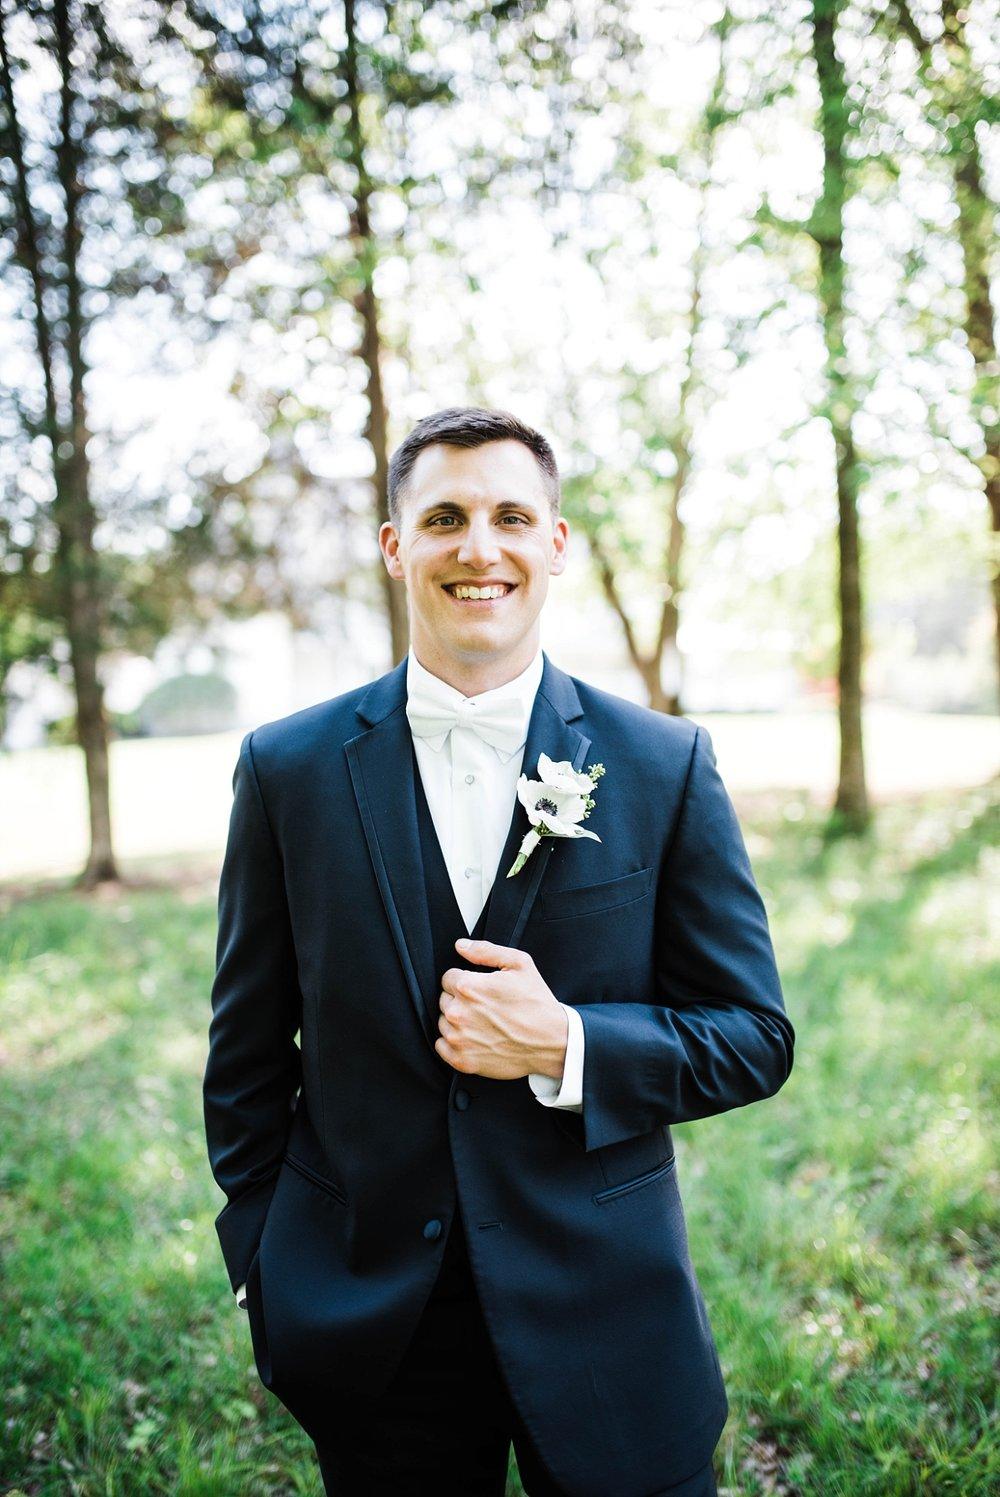 GROOM'S PORTRAIT | NAVY SUIT| ELEGANT SPRING WEDDING AT THE SONNET HOUSE | TJ & SHELBY | JOHNSON WEDDING